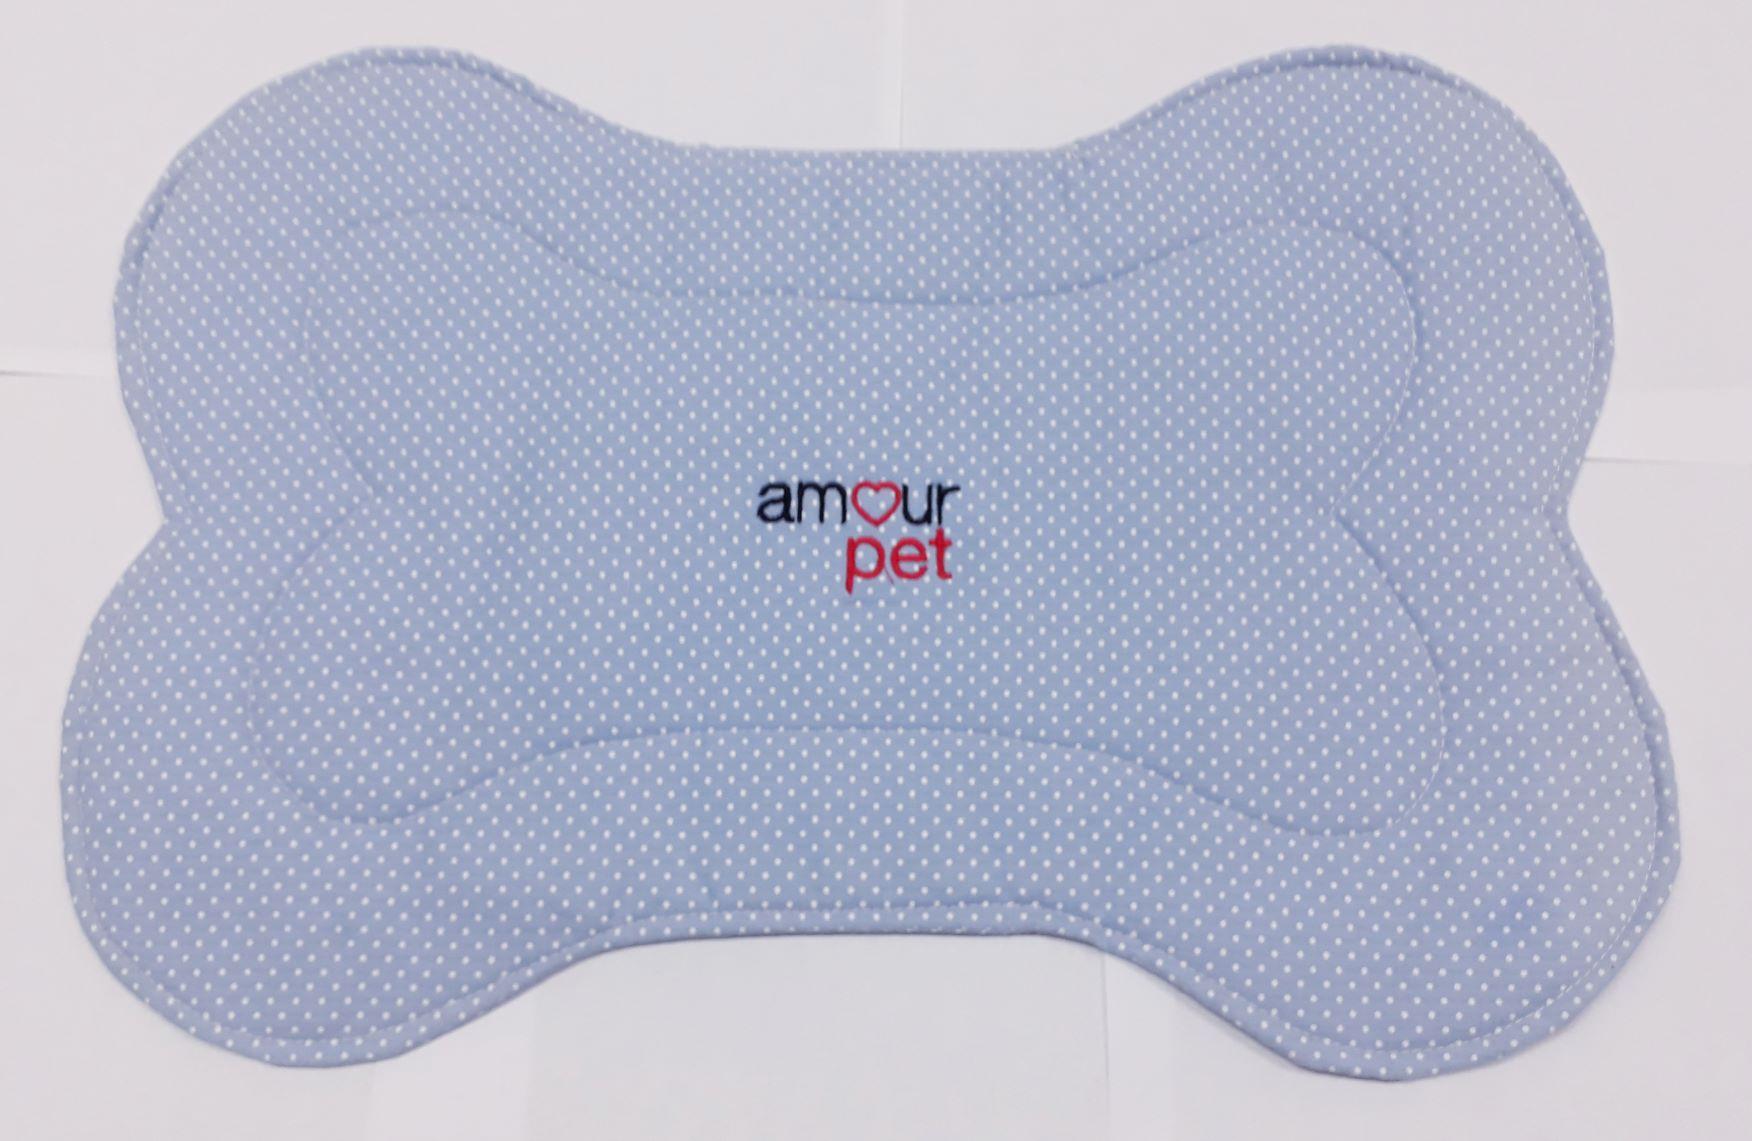 Jogos Americanos Pet Amour Poa Azul E Branco